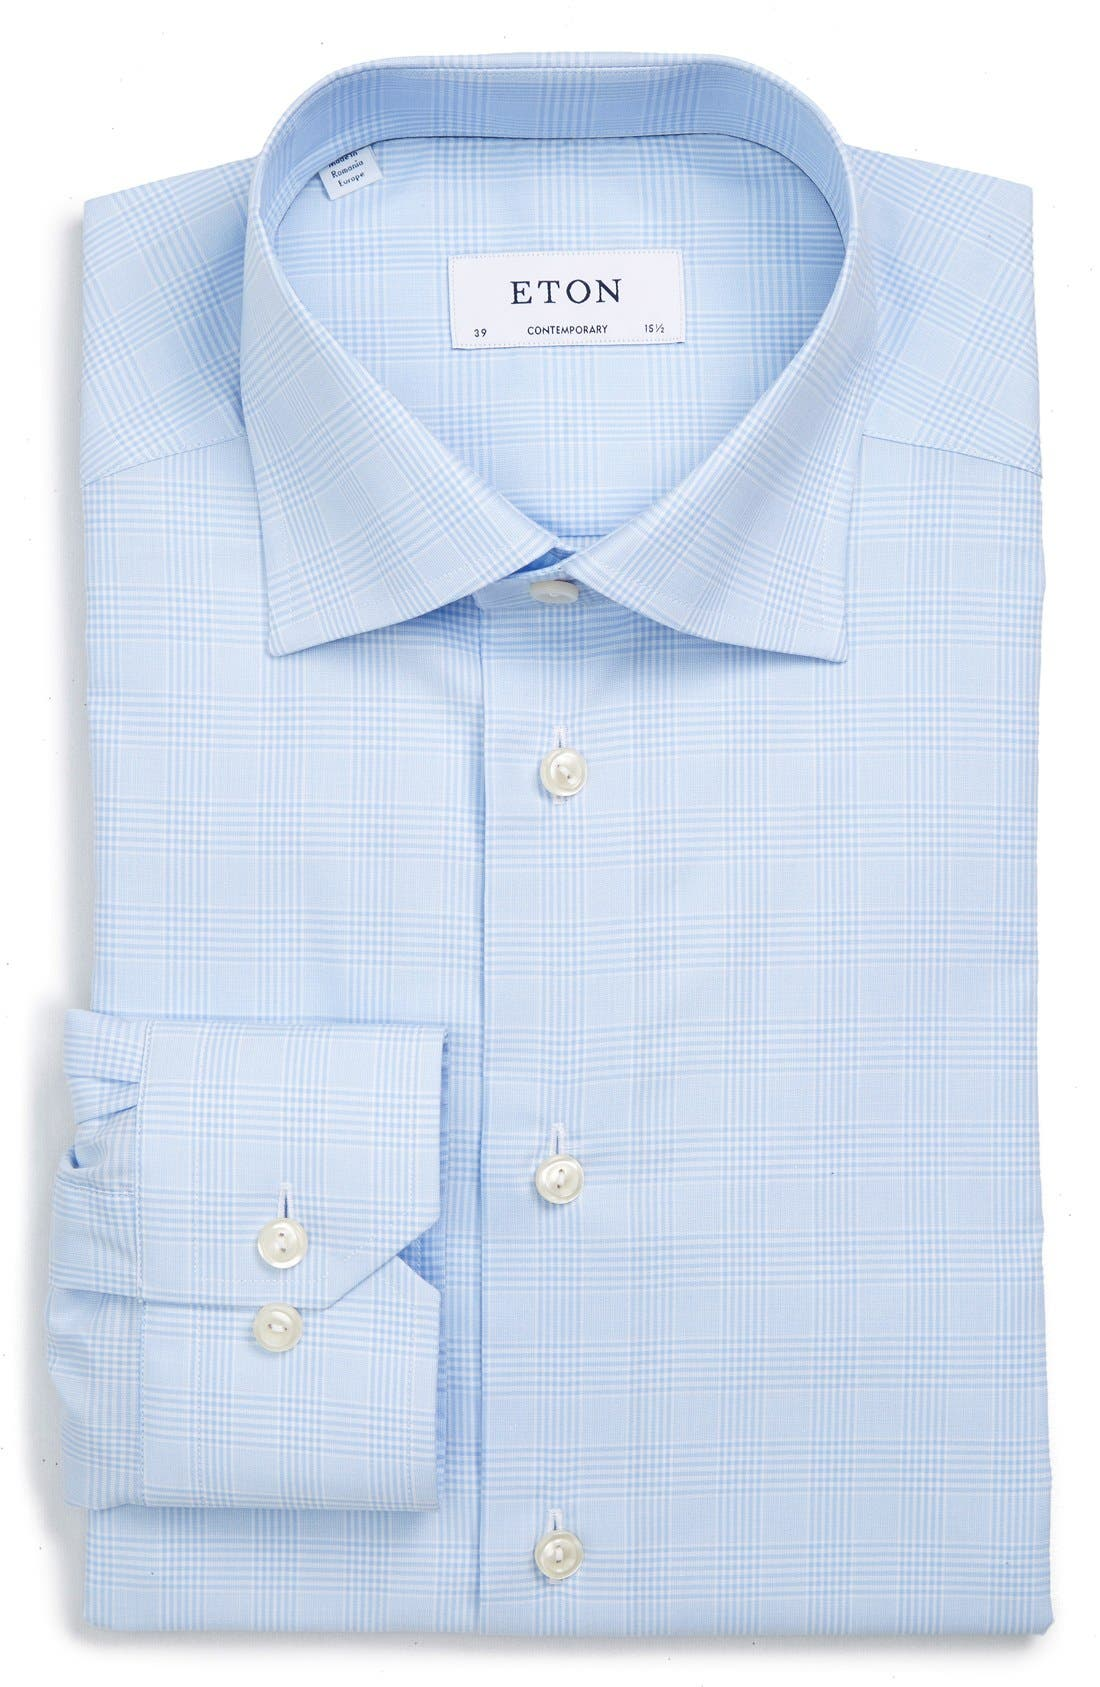 Alternate Image 1 Selected - Eton Contemporary Fit Plaid Dress Shirt